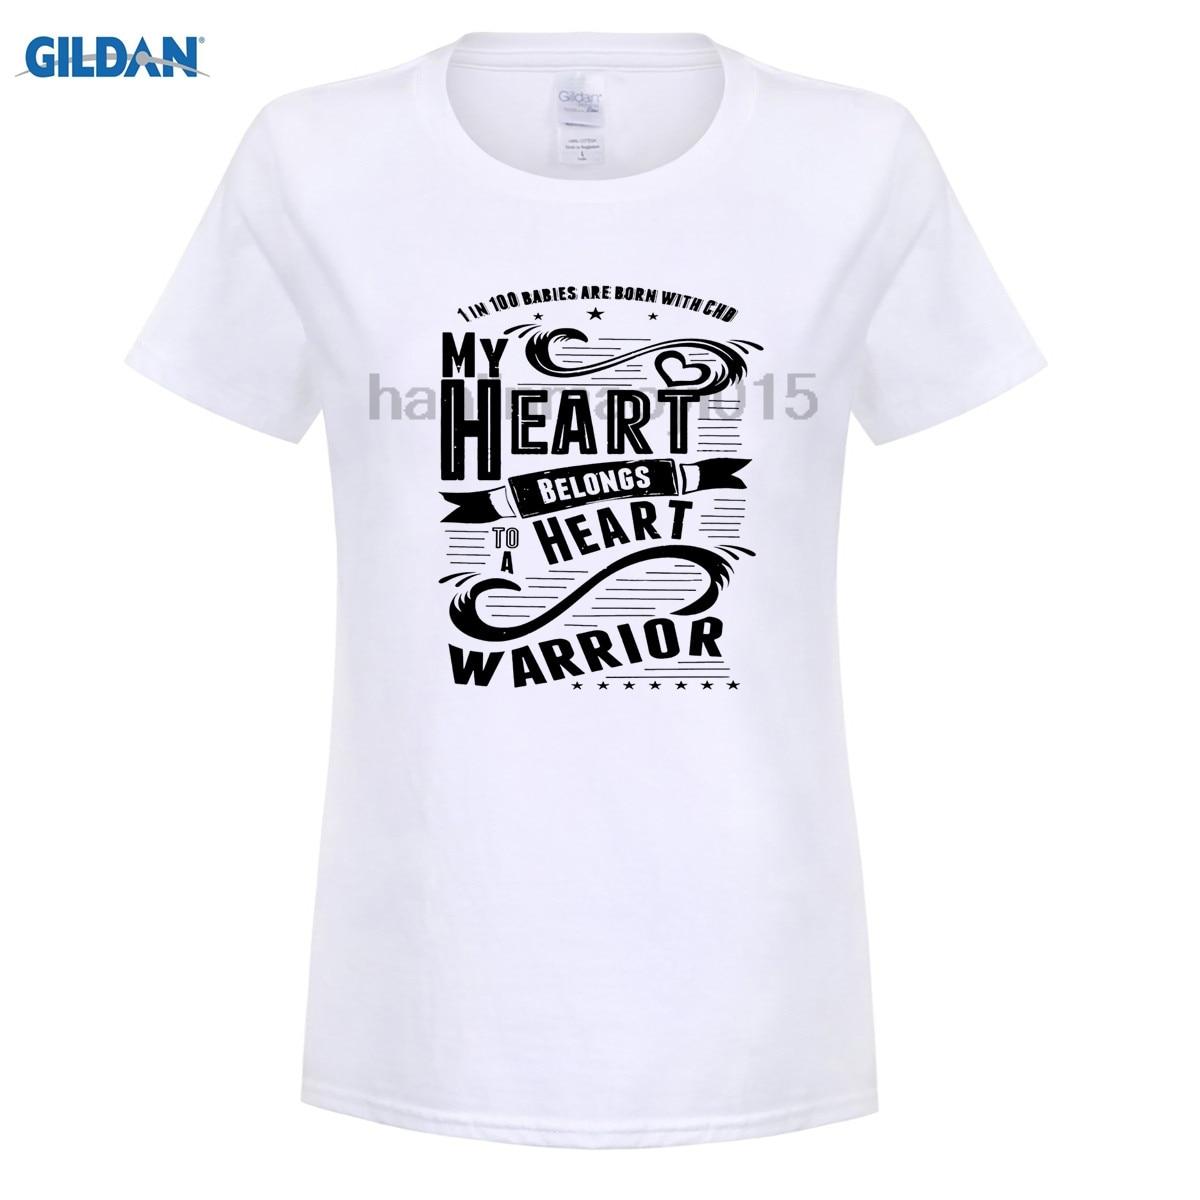 GILDAN 100% Cotton O-neck printed T-shirt CHD Shirts My Heart Belongs To A Heart Warrior T-Shirt for women